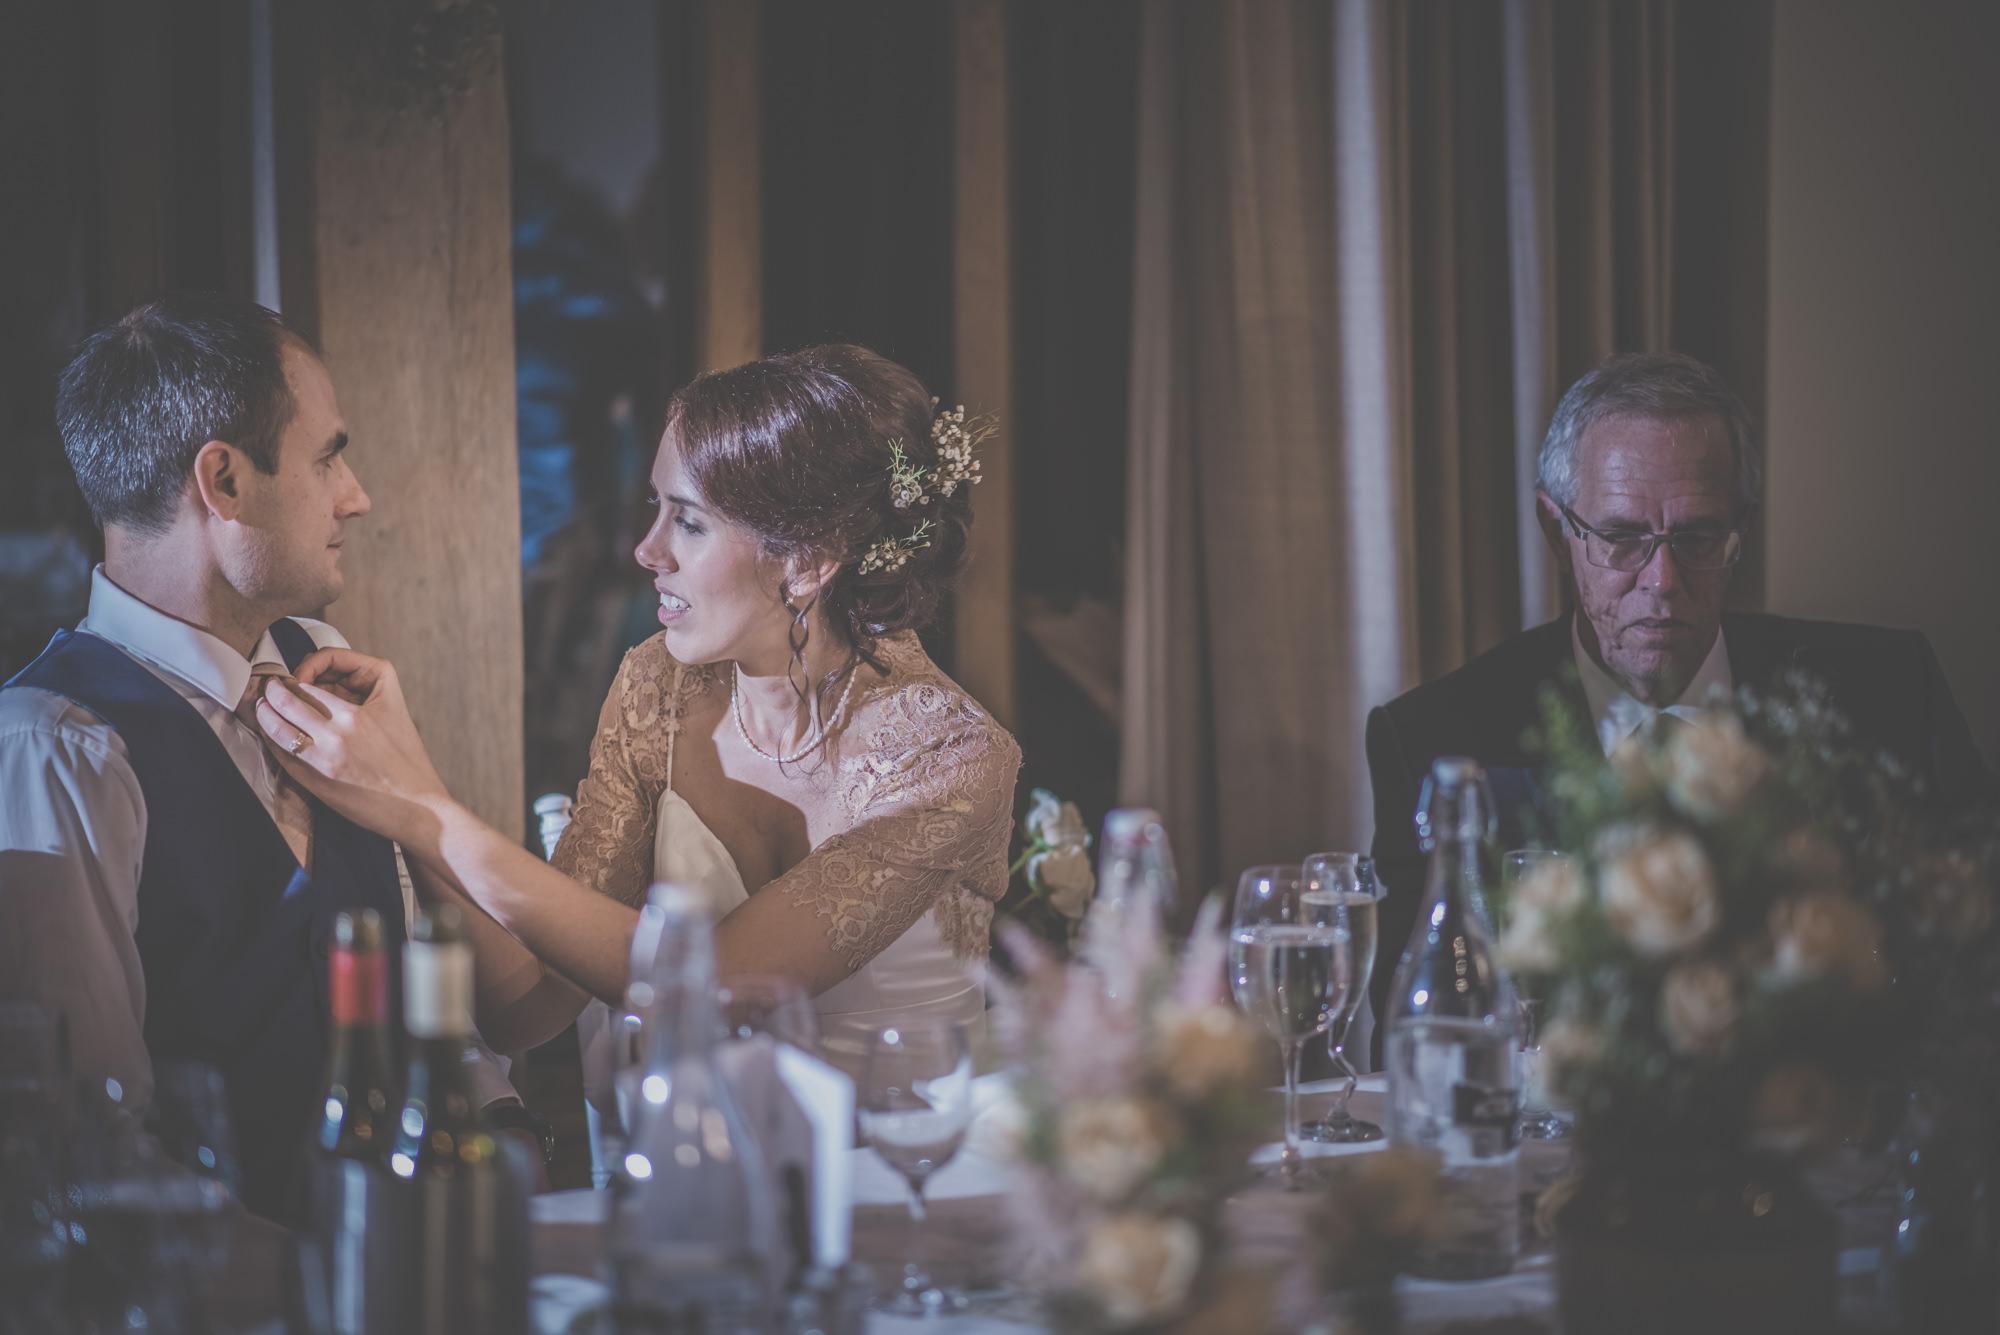 Charisse-and-James-wedding-in-Cain-Manor-Venue-Hampshire-Manu-Mendoza-Wedding-Photography-446.jpg